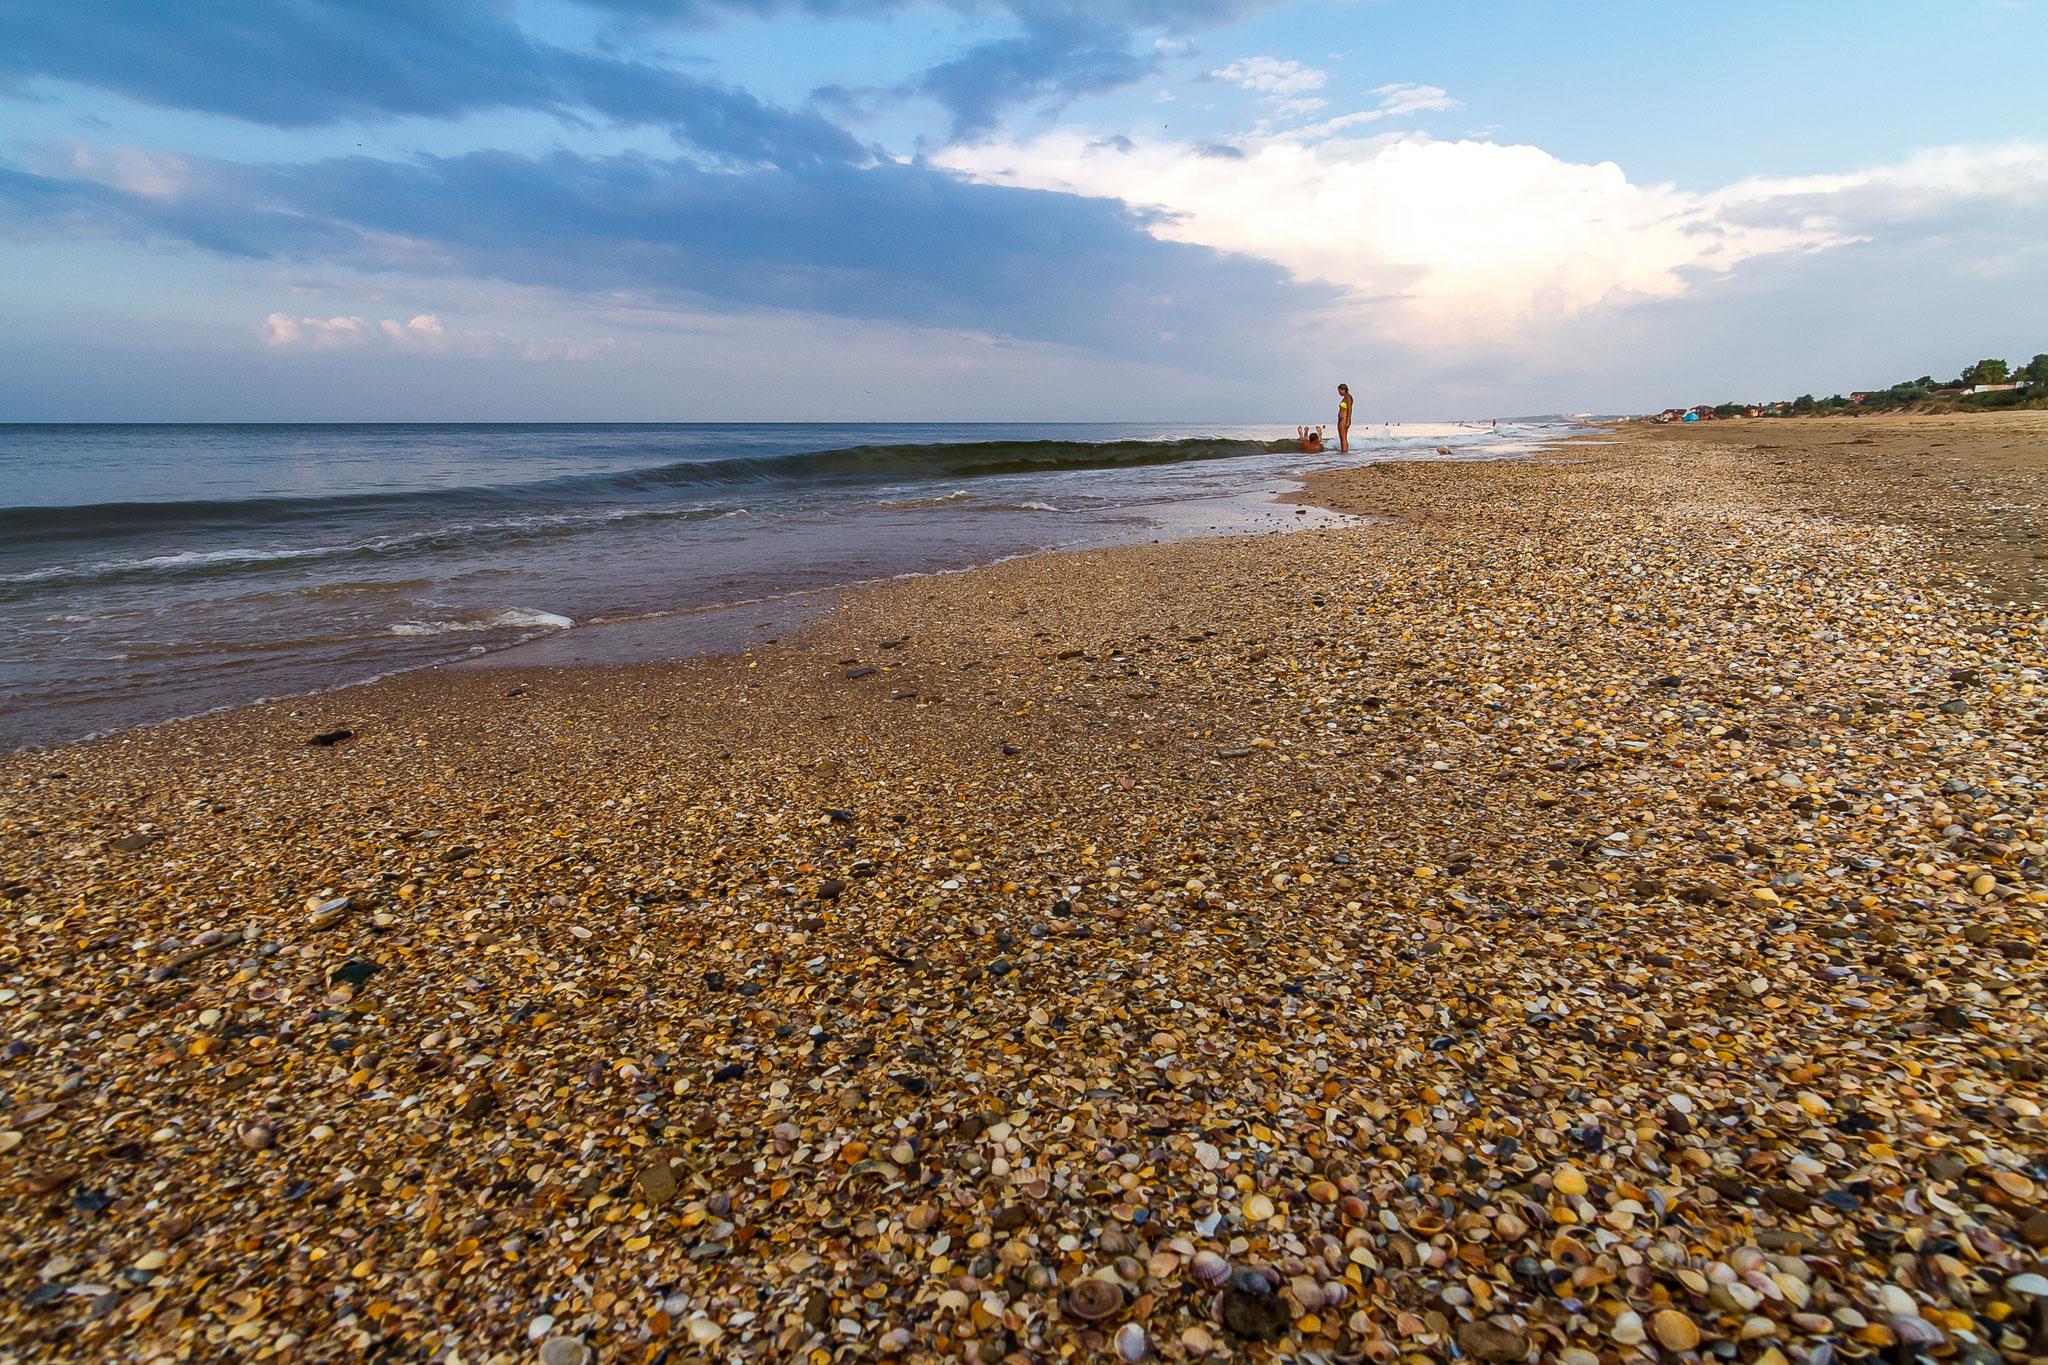 территории картинки азовского моря краснодарский край целый